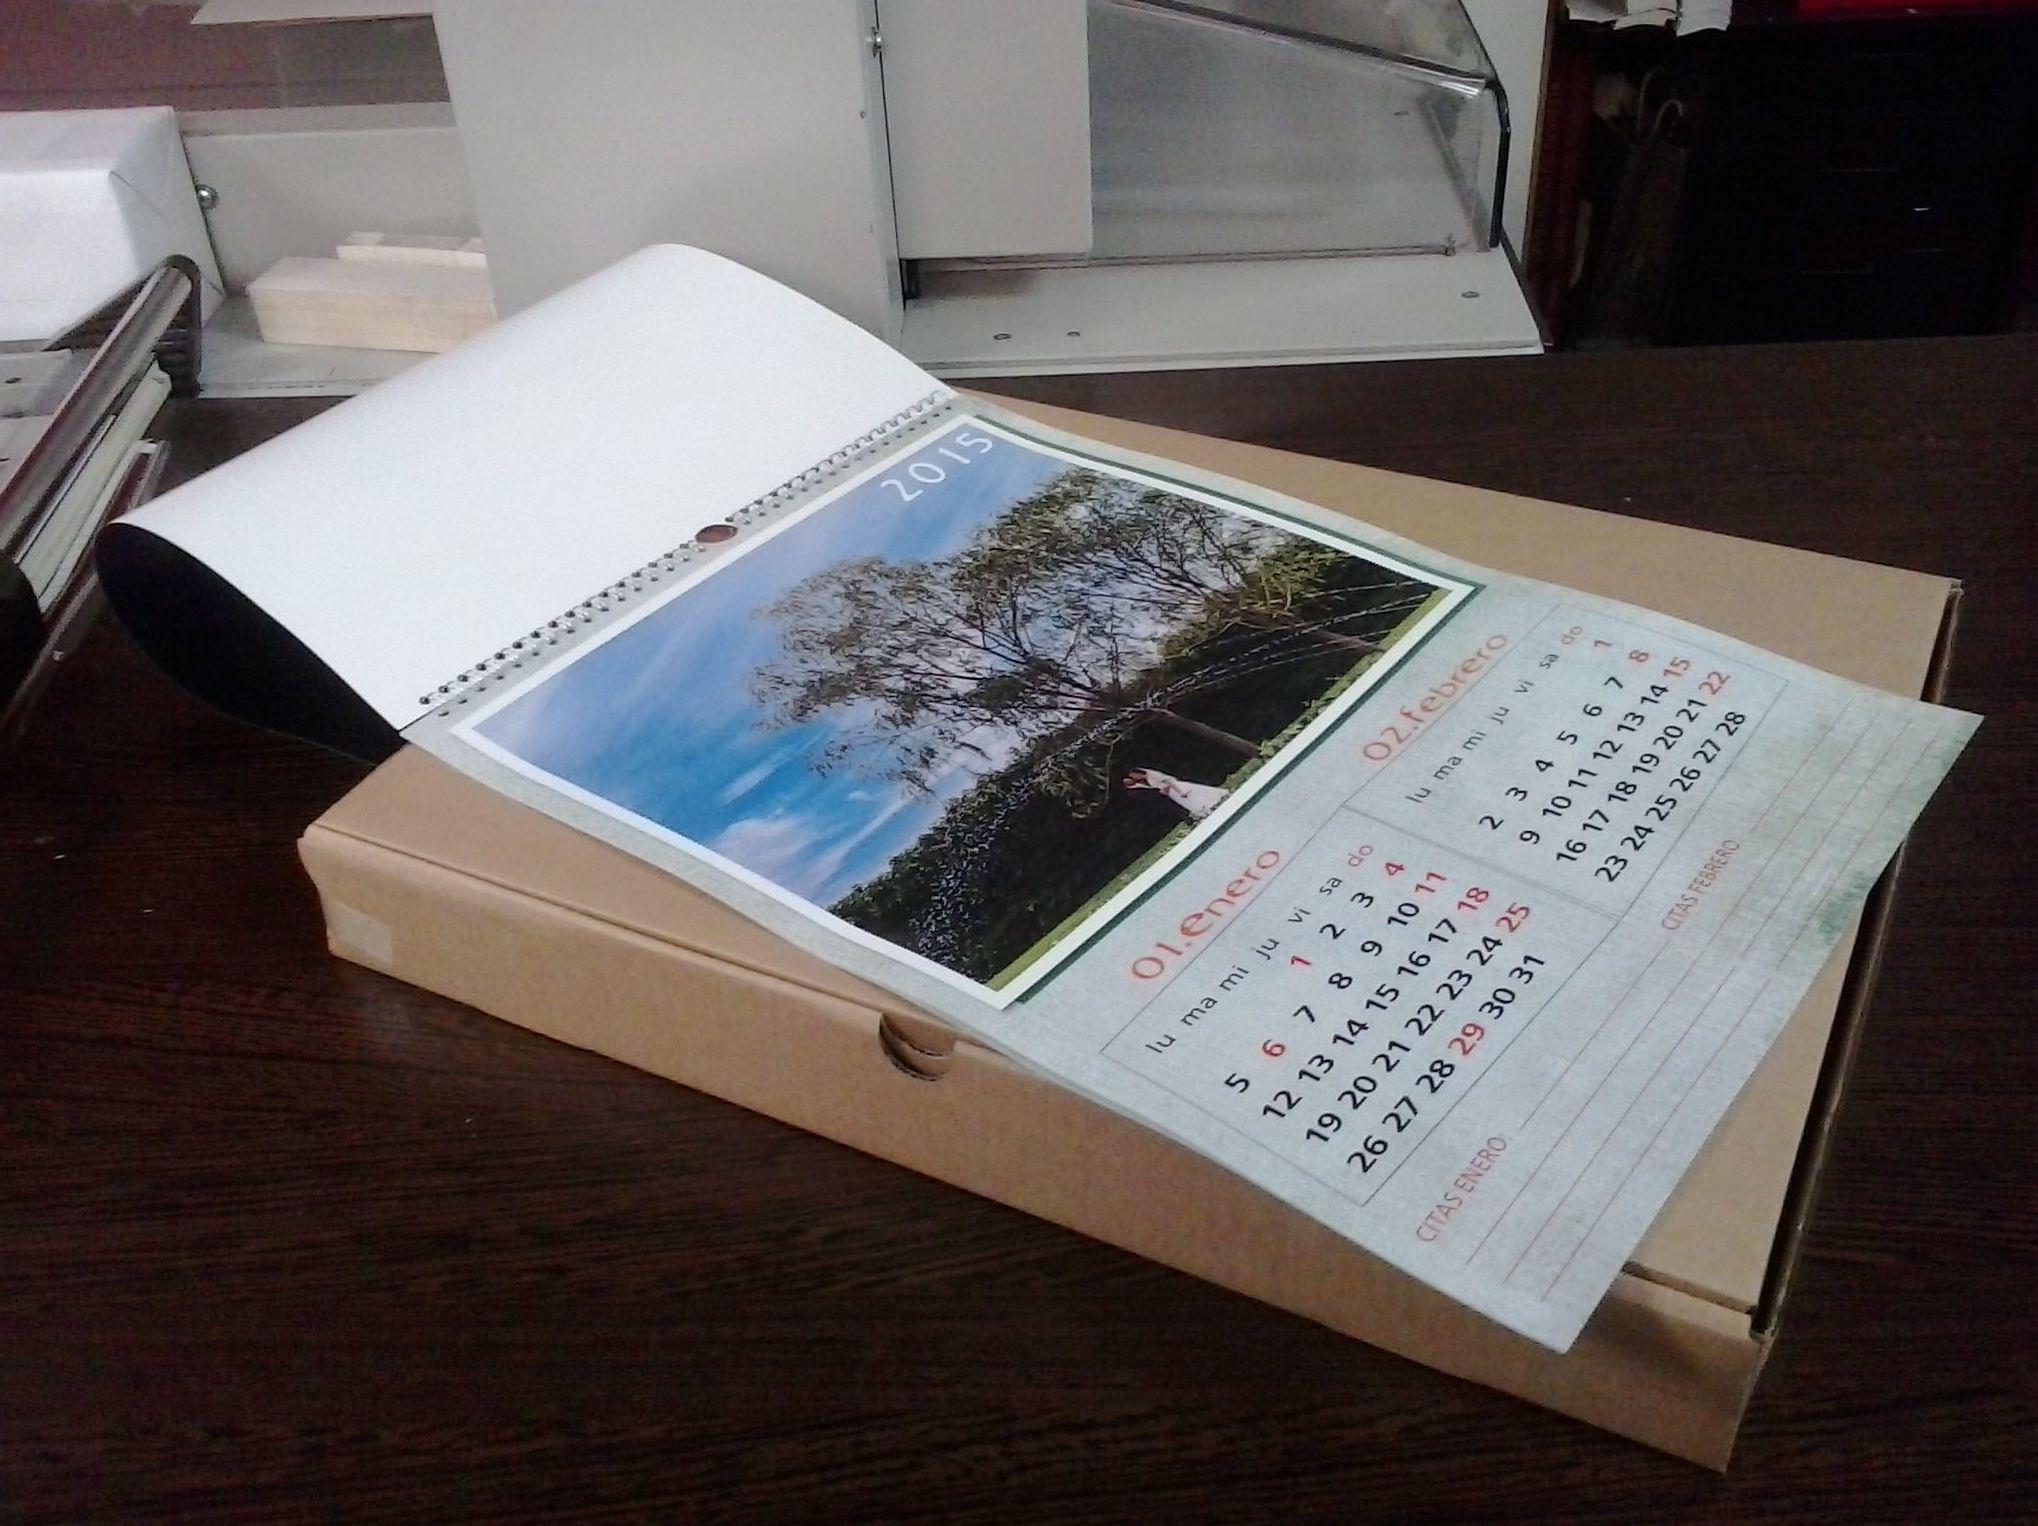 Impresión digital calendarios personalizados en Zaragoza